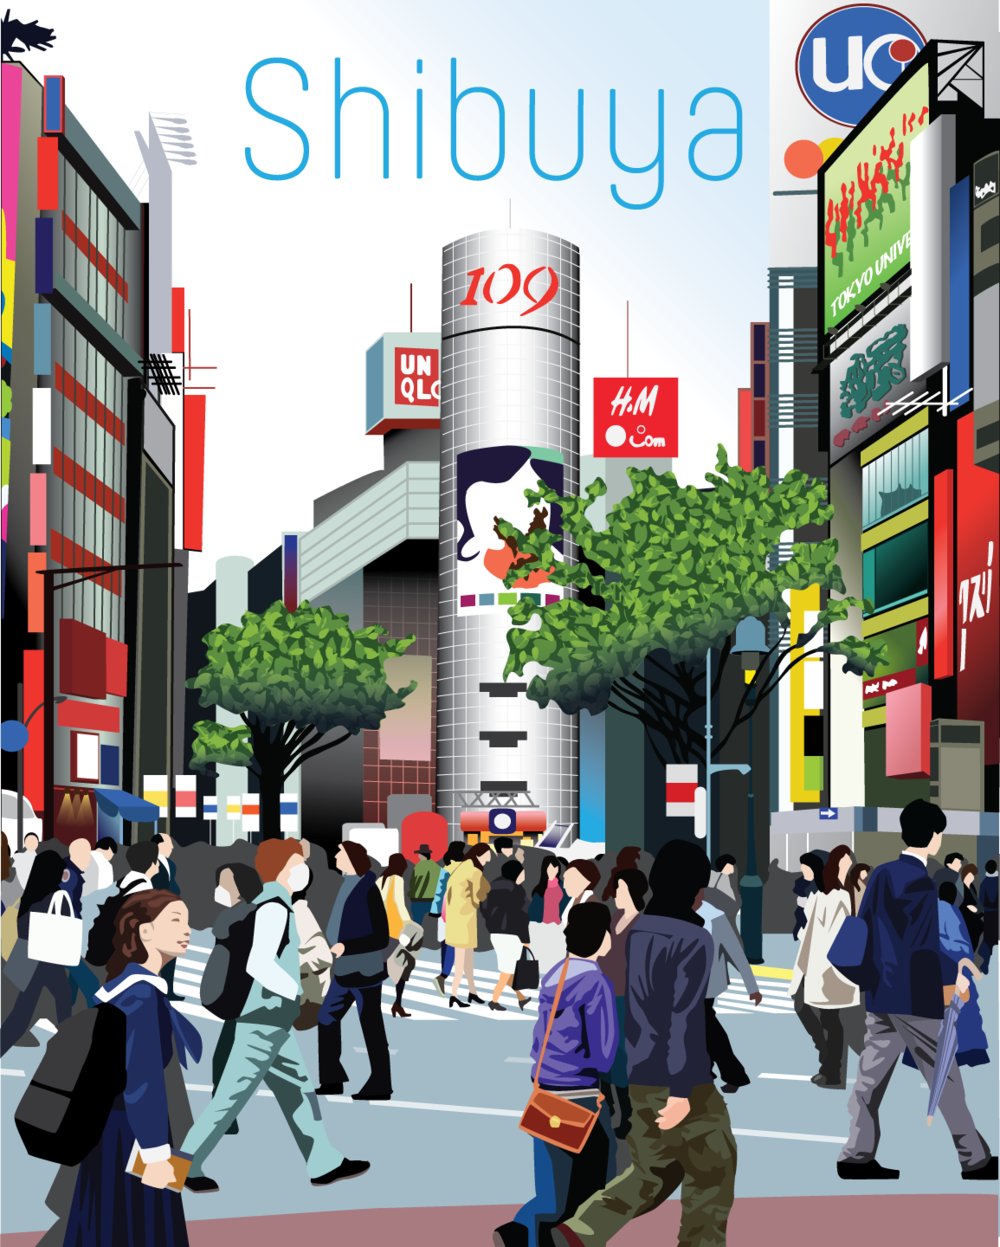 Shibuya Poster.png